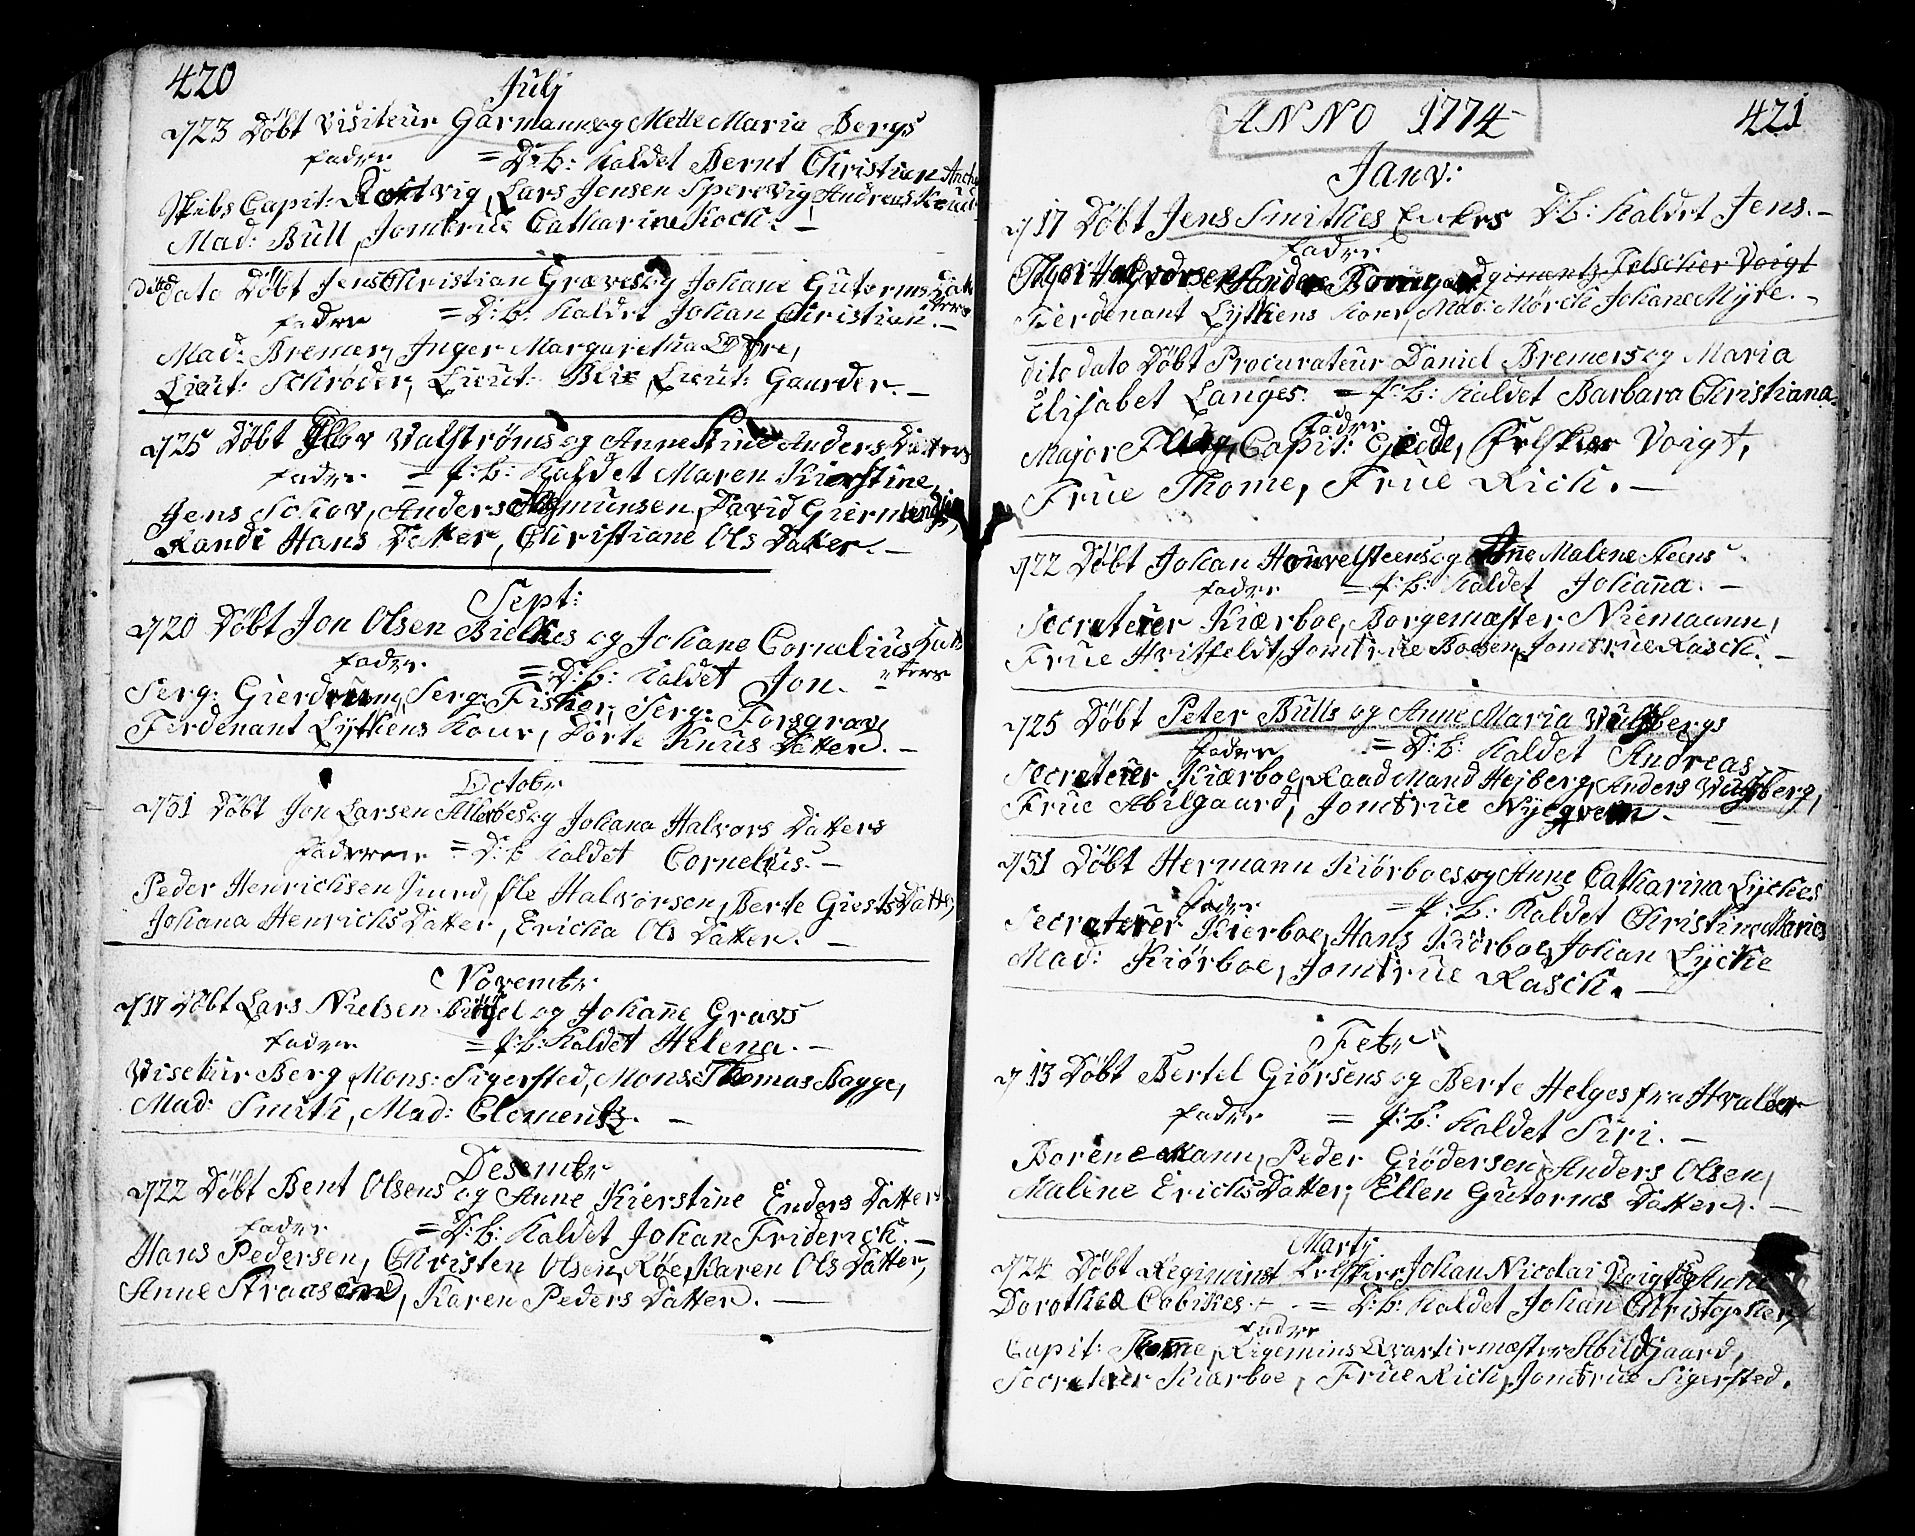 SAO, Fredrikstad prestekontor Kirkebøker, F/Fa/L0002: Ministerialbok nr. 2, 1750-1804, s. 420-421